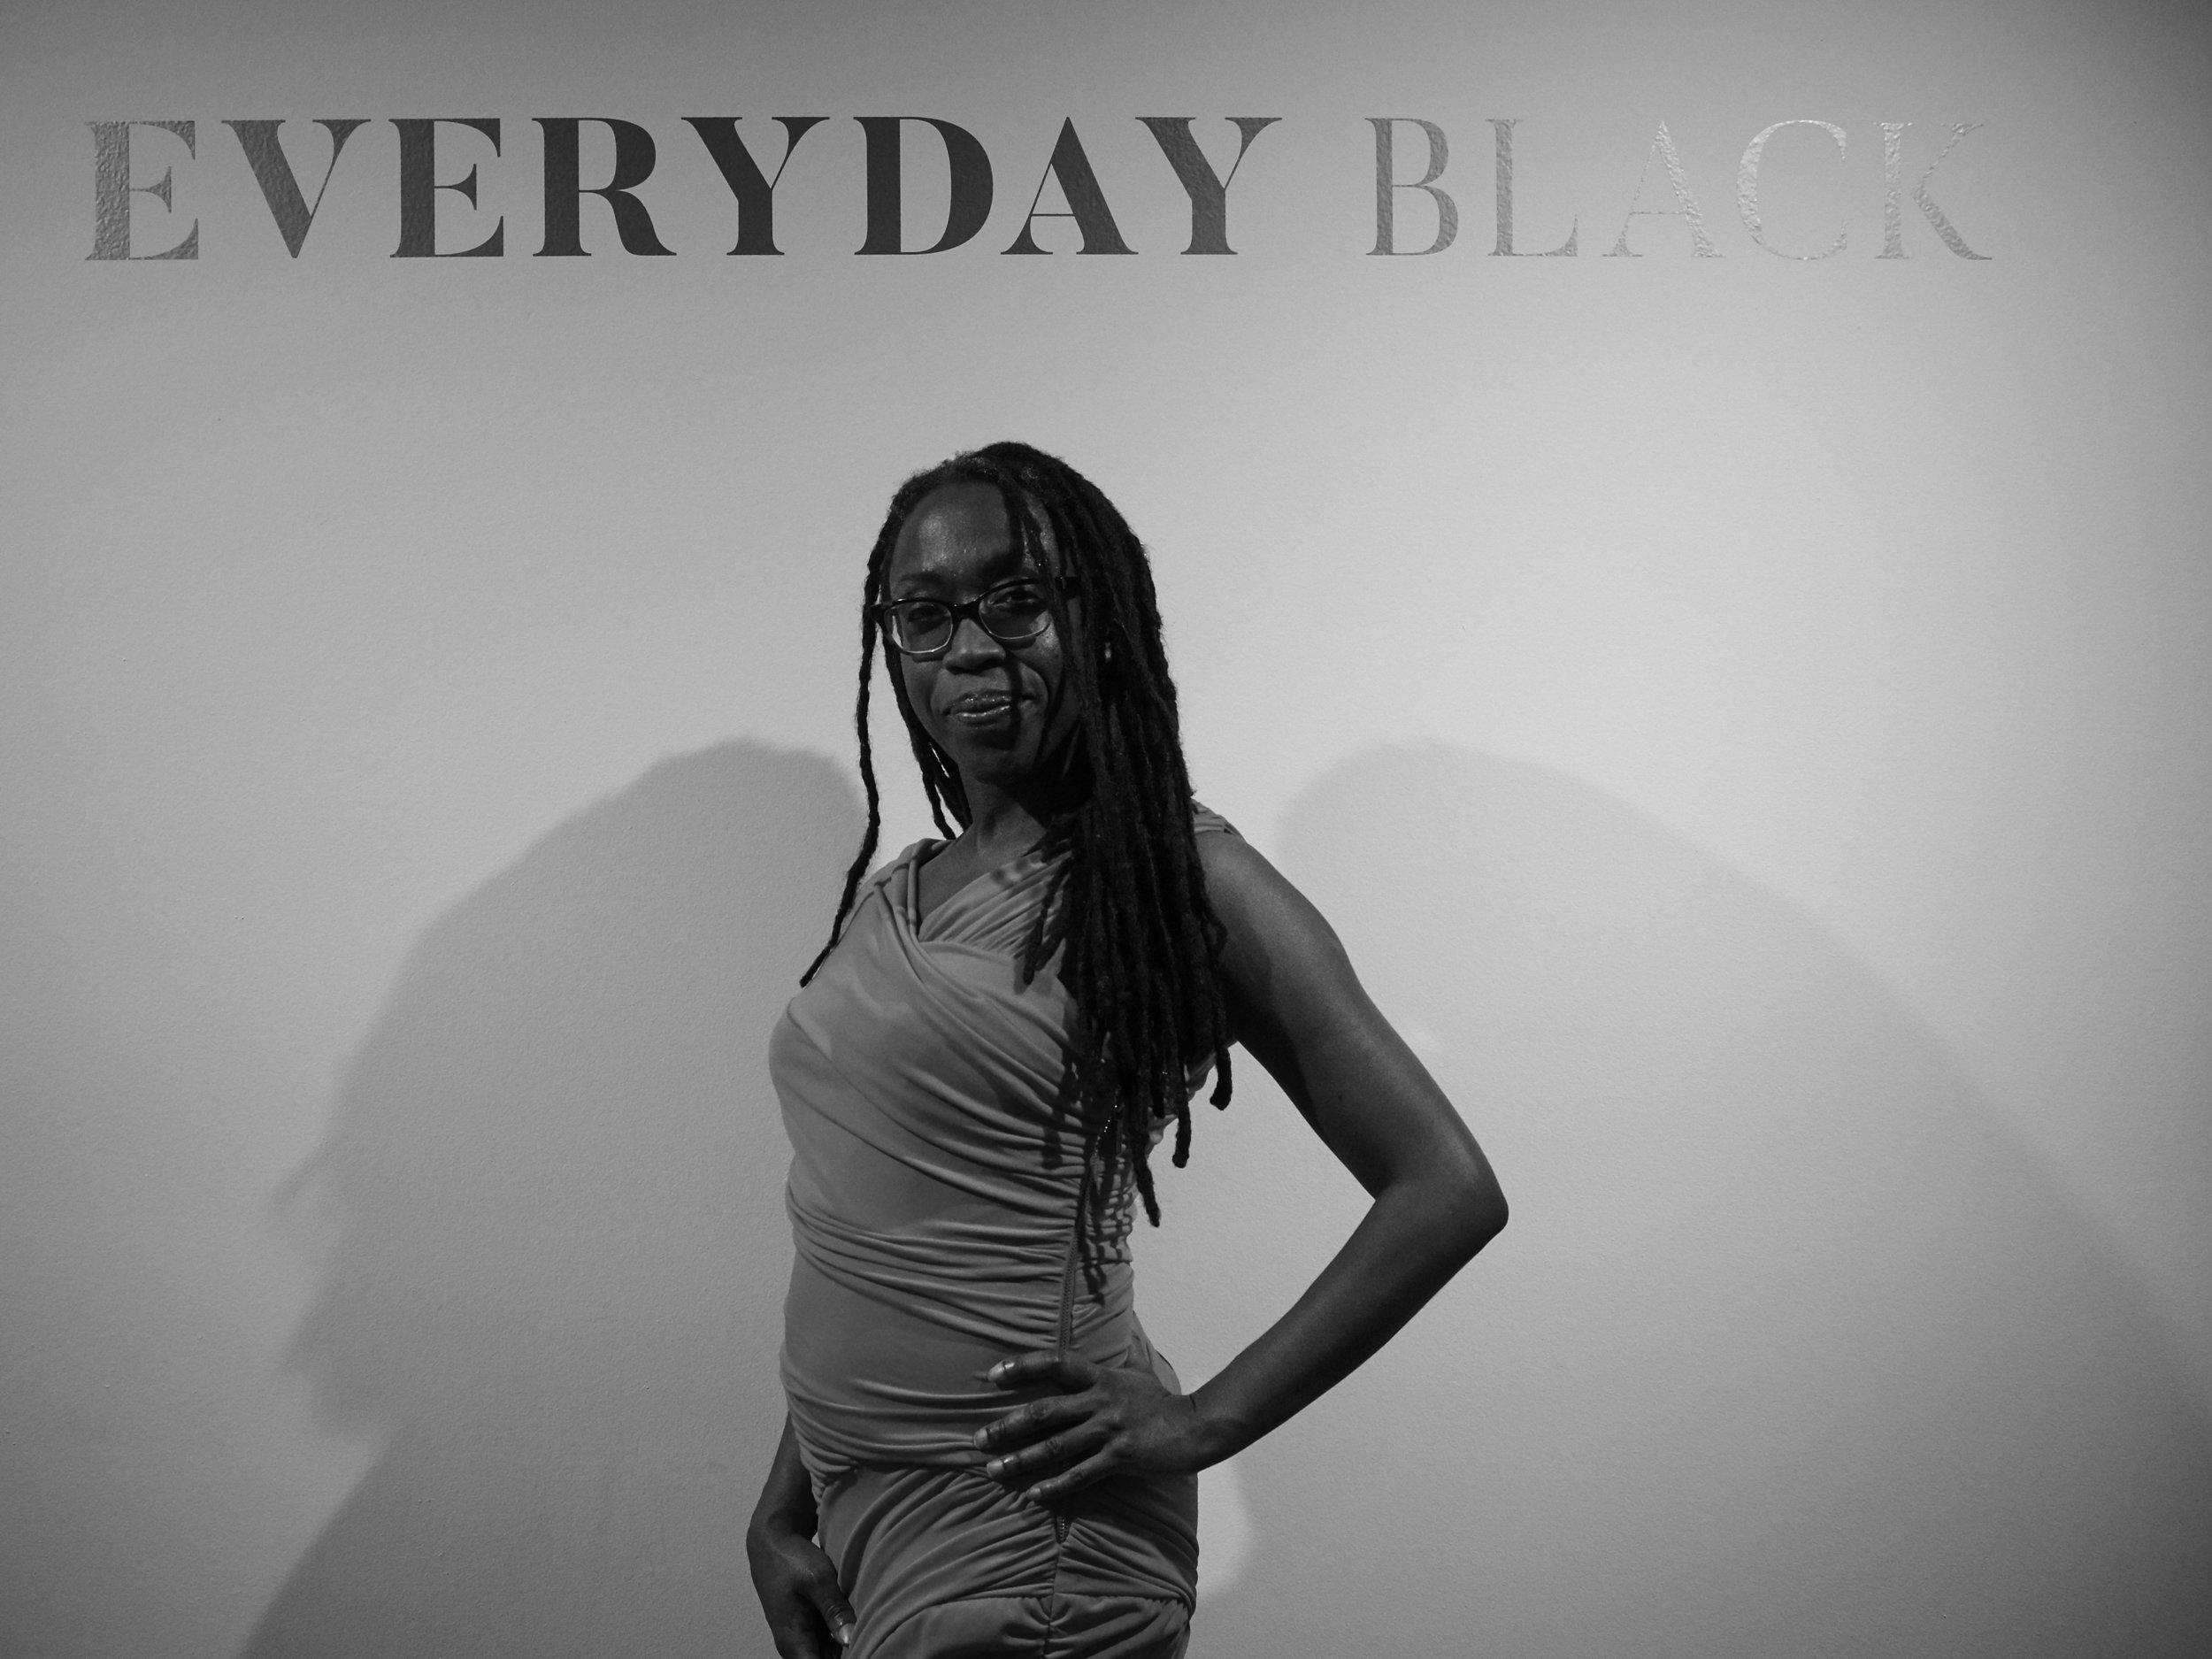 BW_2018114_Everyday_Black_061.jpg